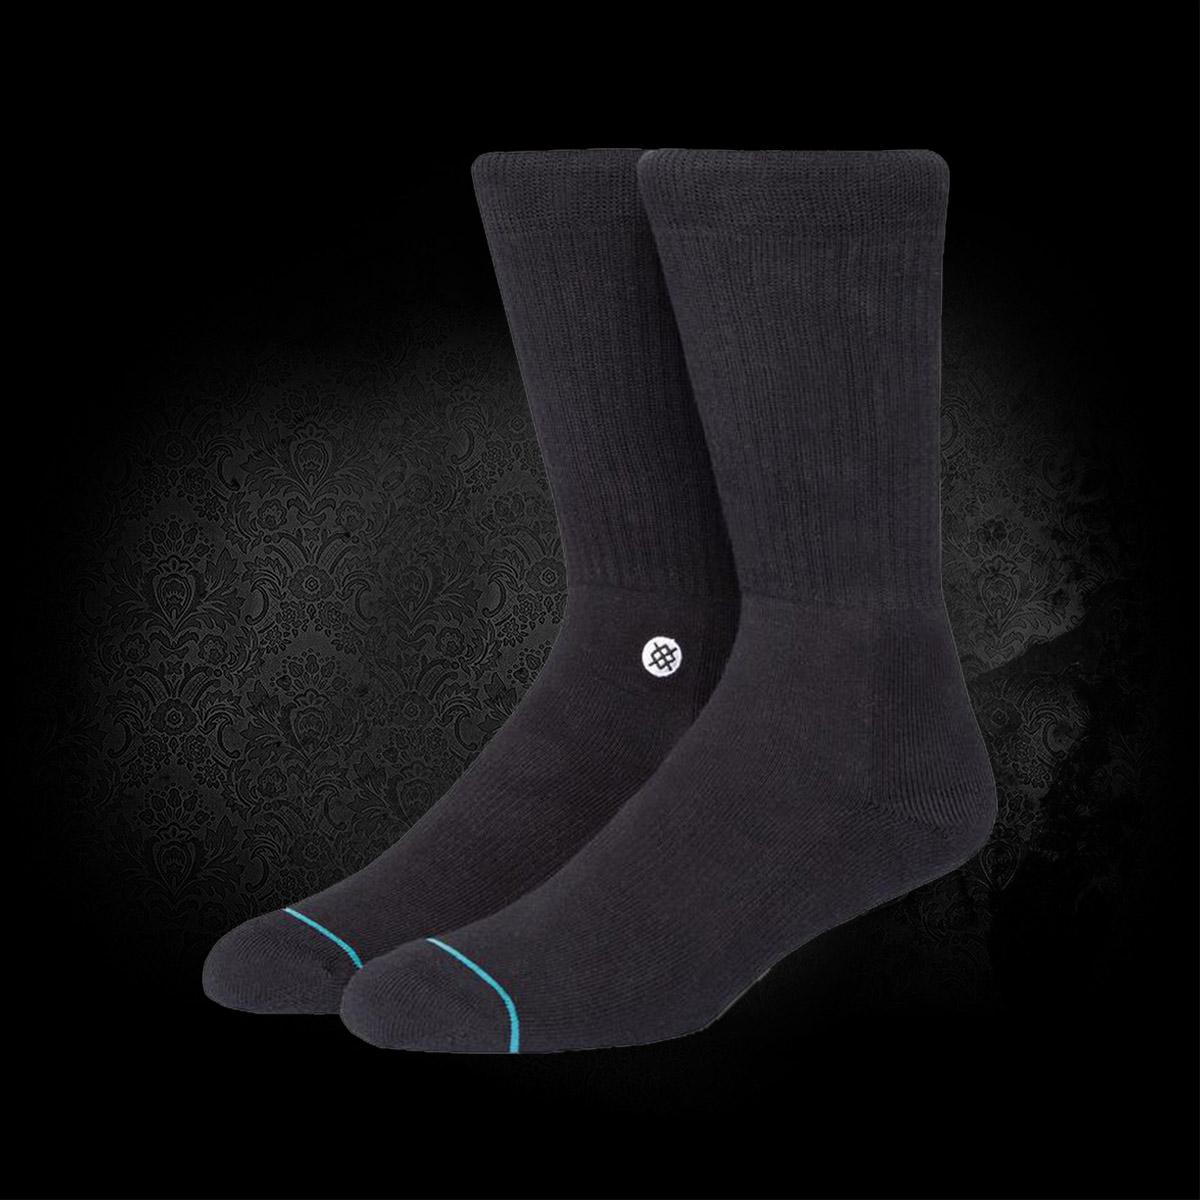 STANCE Čarape ICON